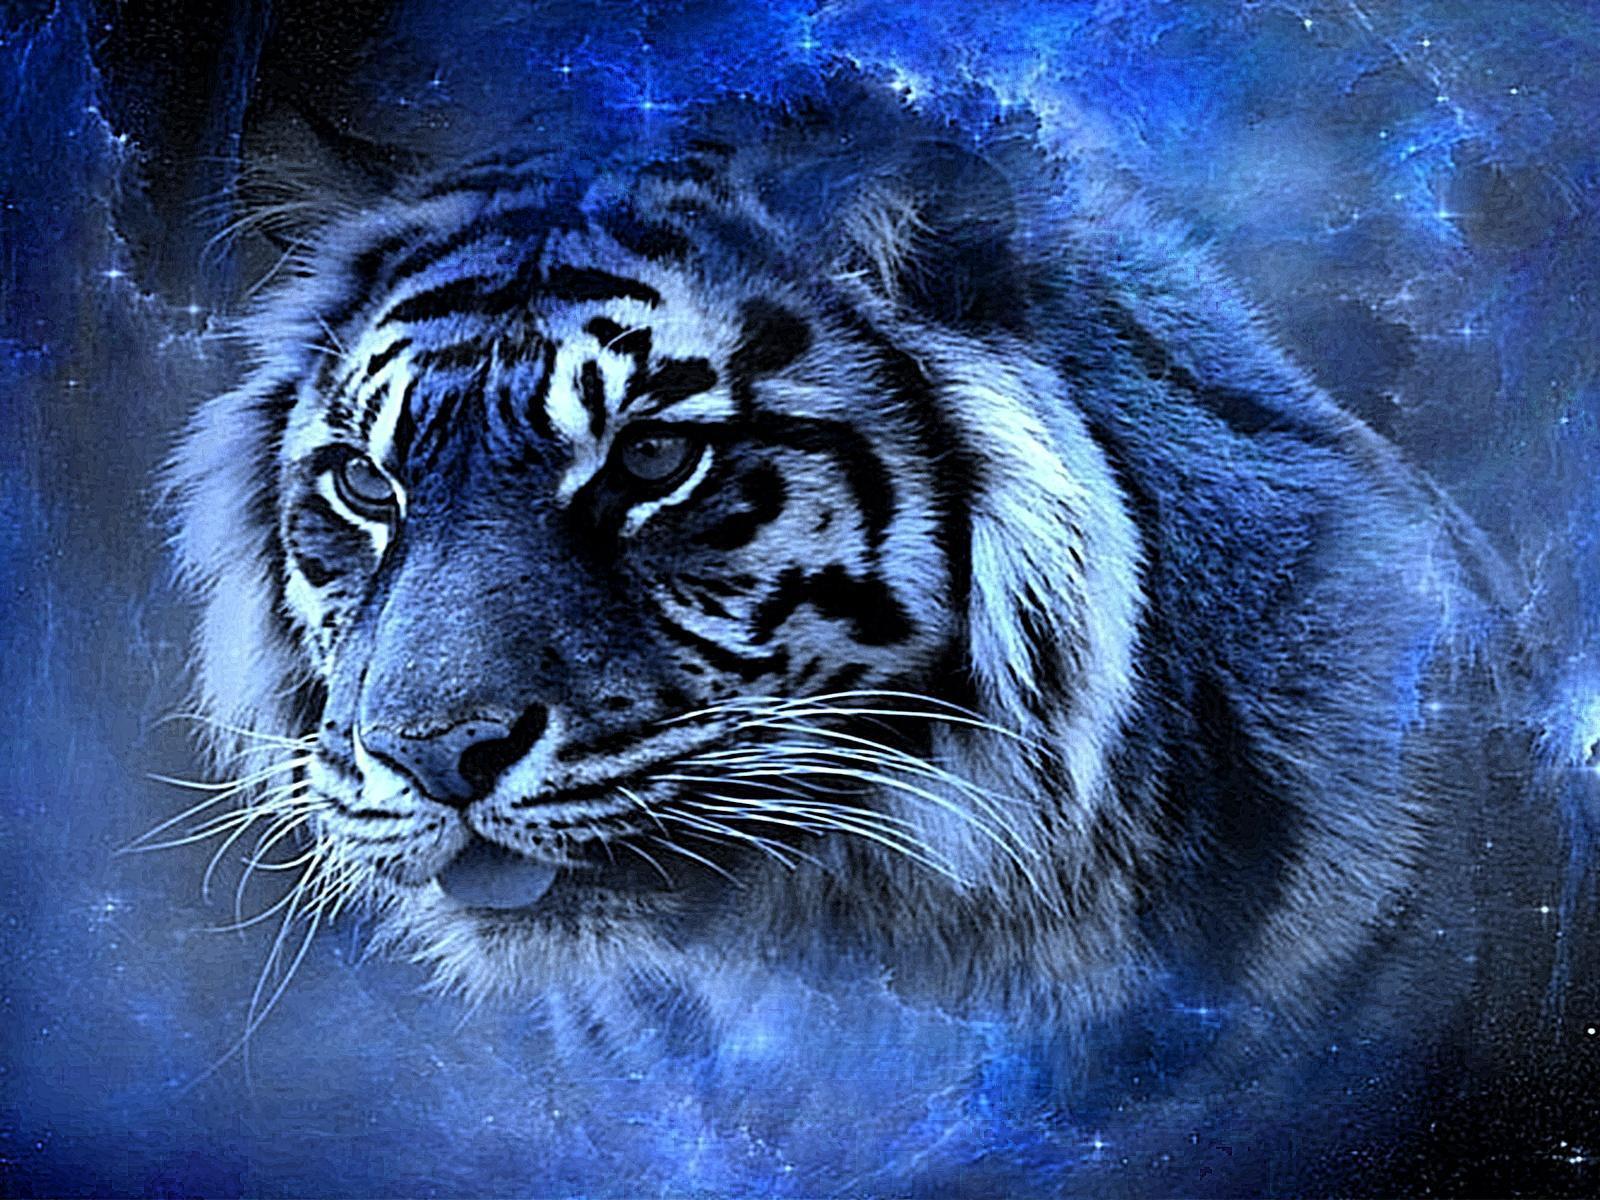 3d Galaxy Wallpaper Desktop Tiger Sch 246 Nheit Hd Desktop Hintergrund Breitbild High